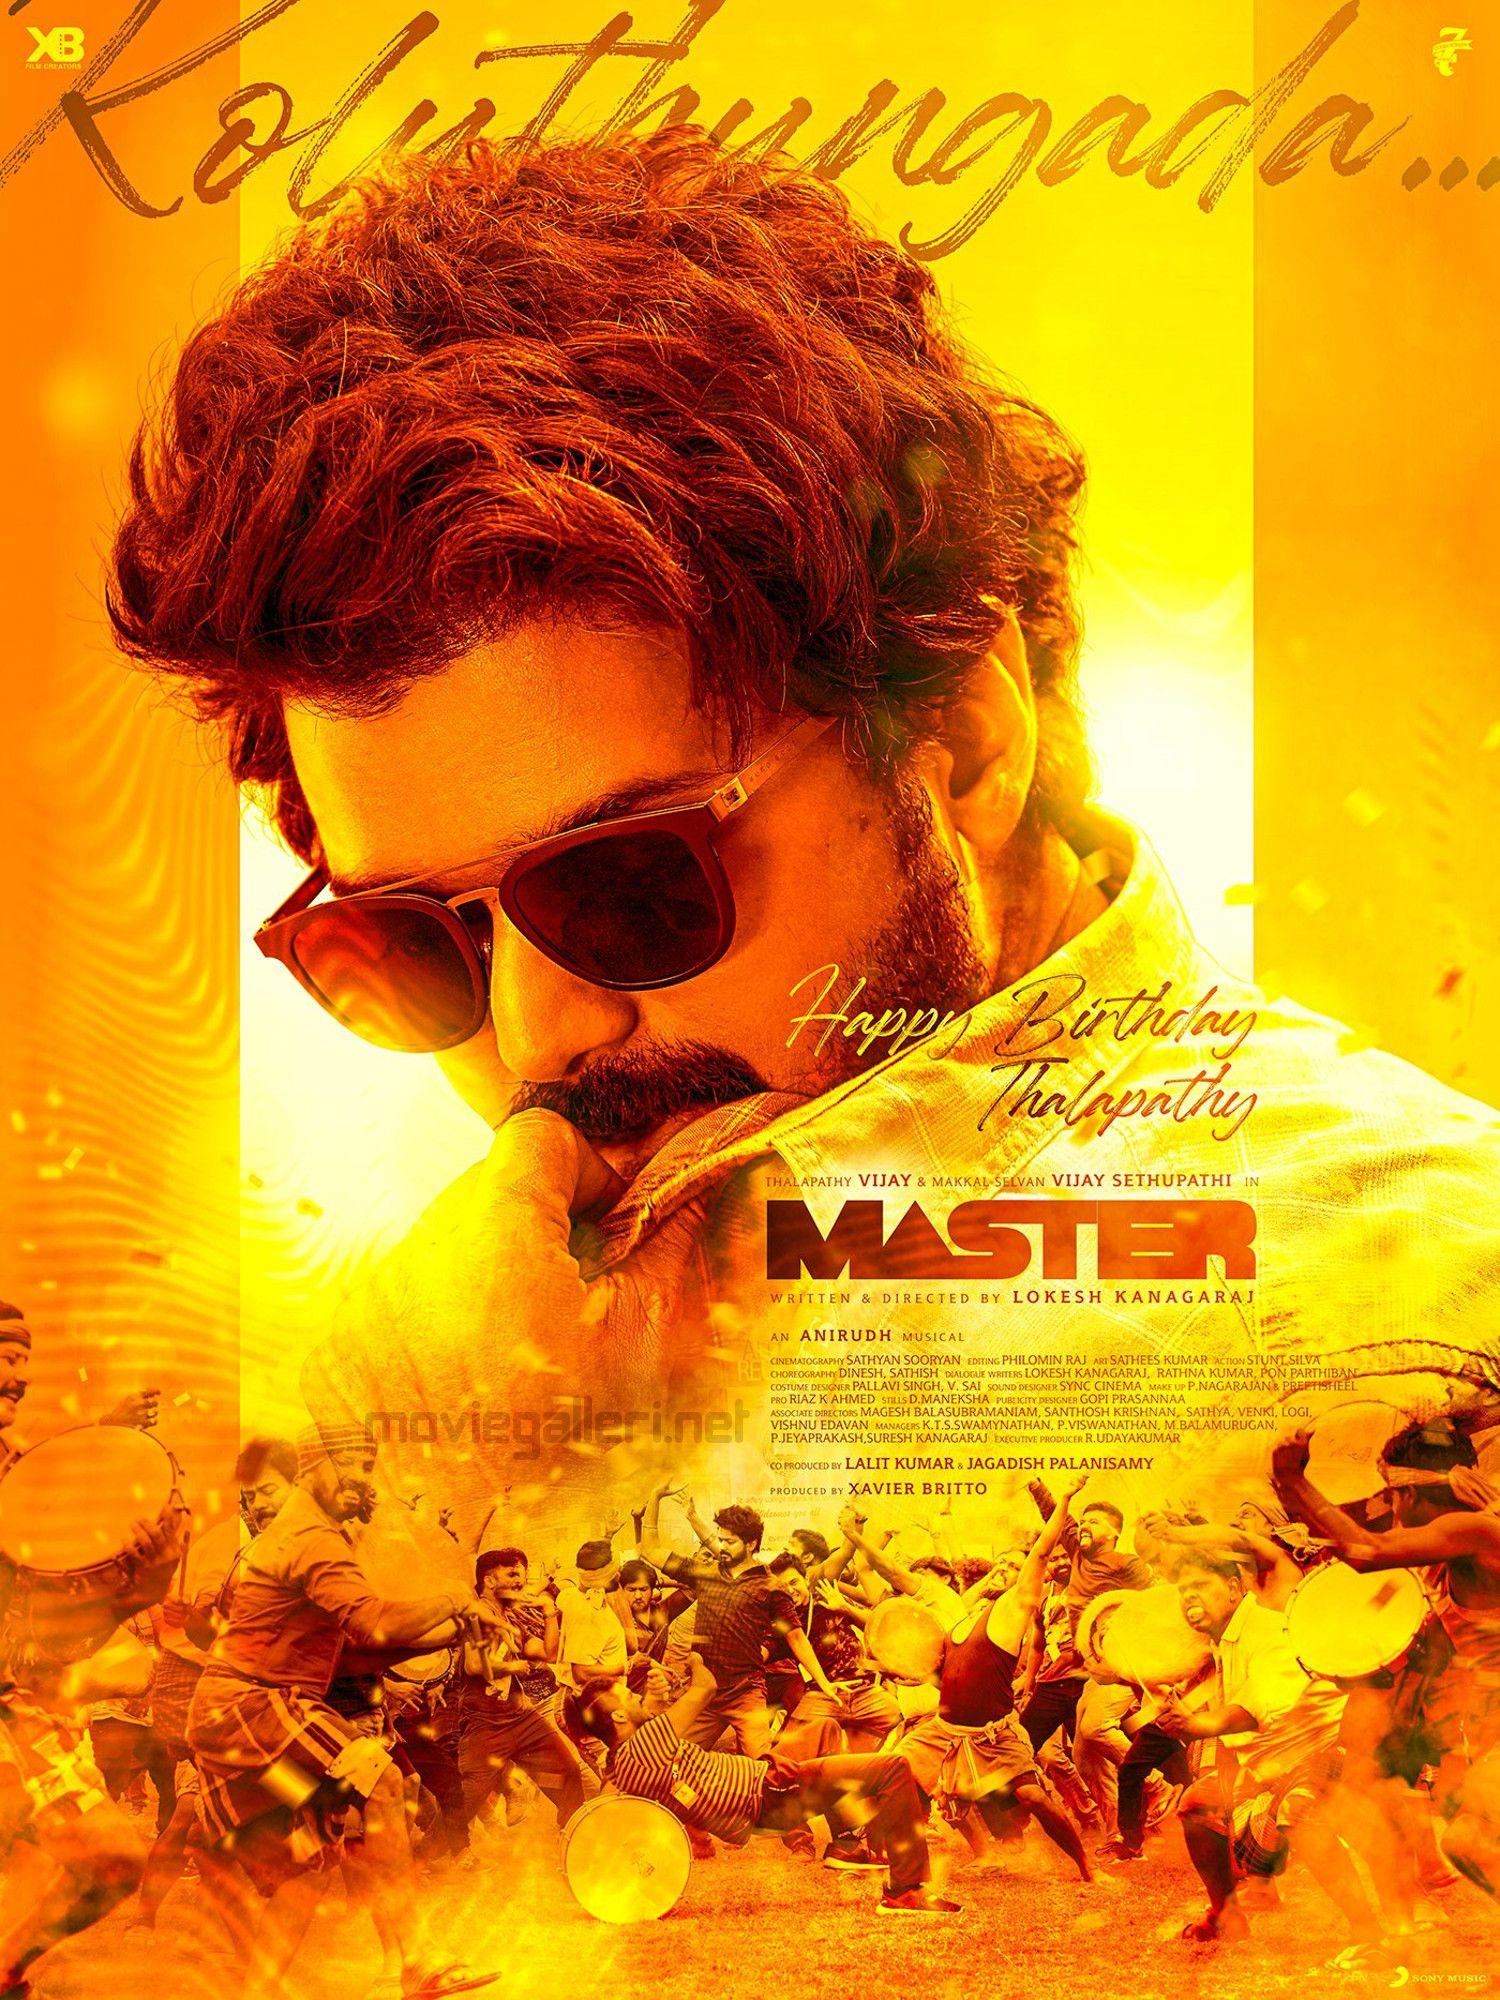 Master Vijay HD Wallpapers - Wallpaper Cave